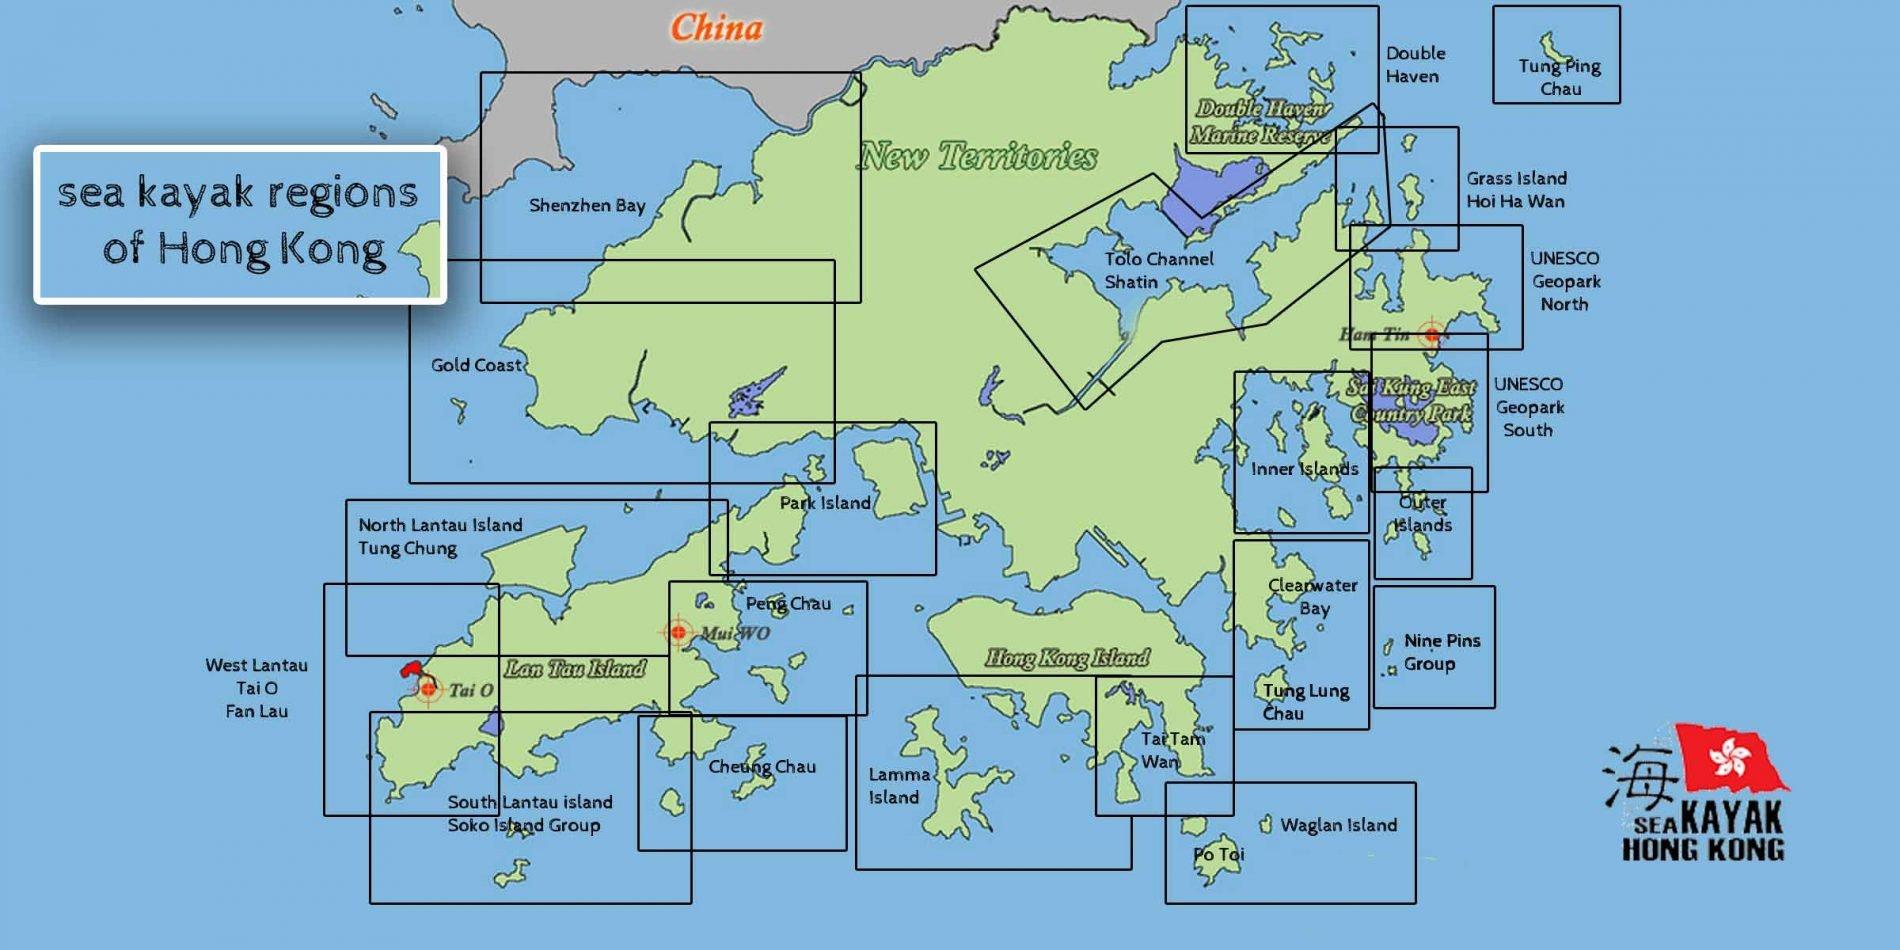 sea kayak regions of Hong Kong